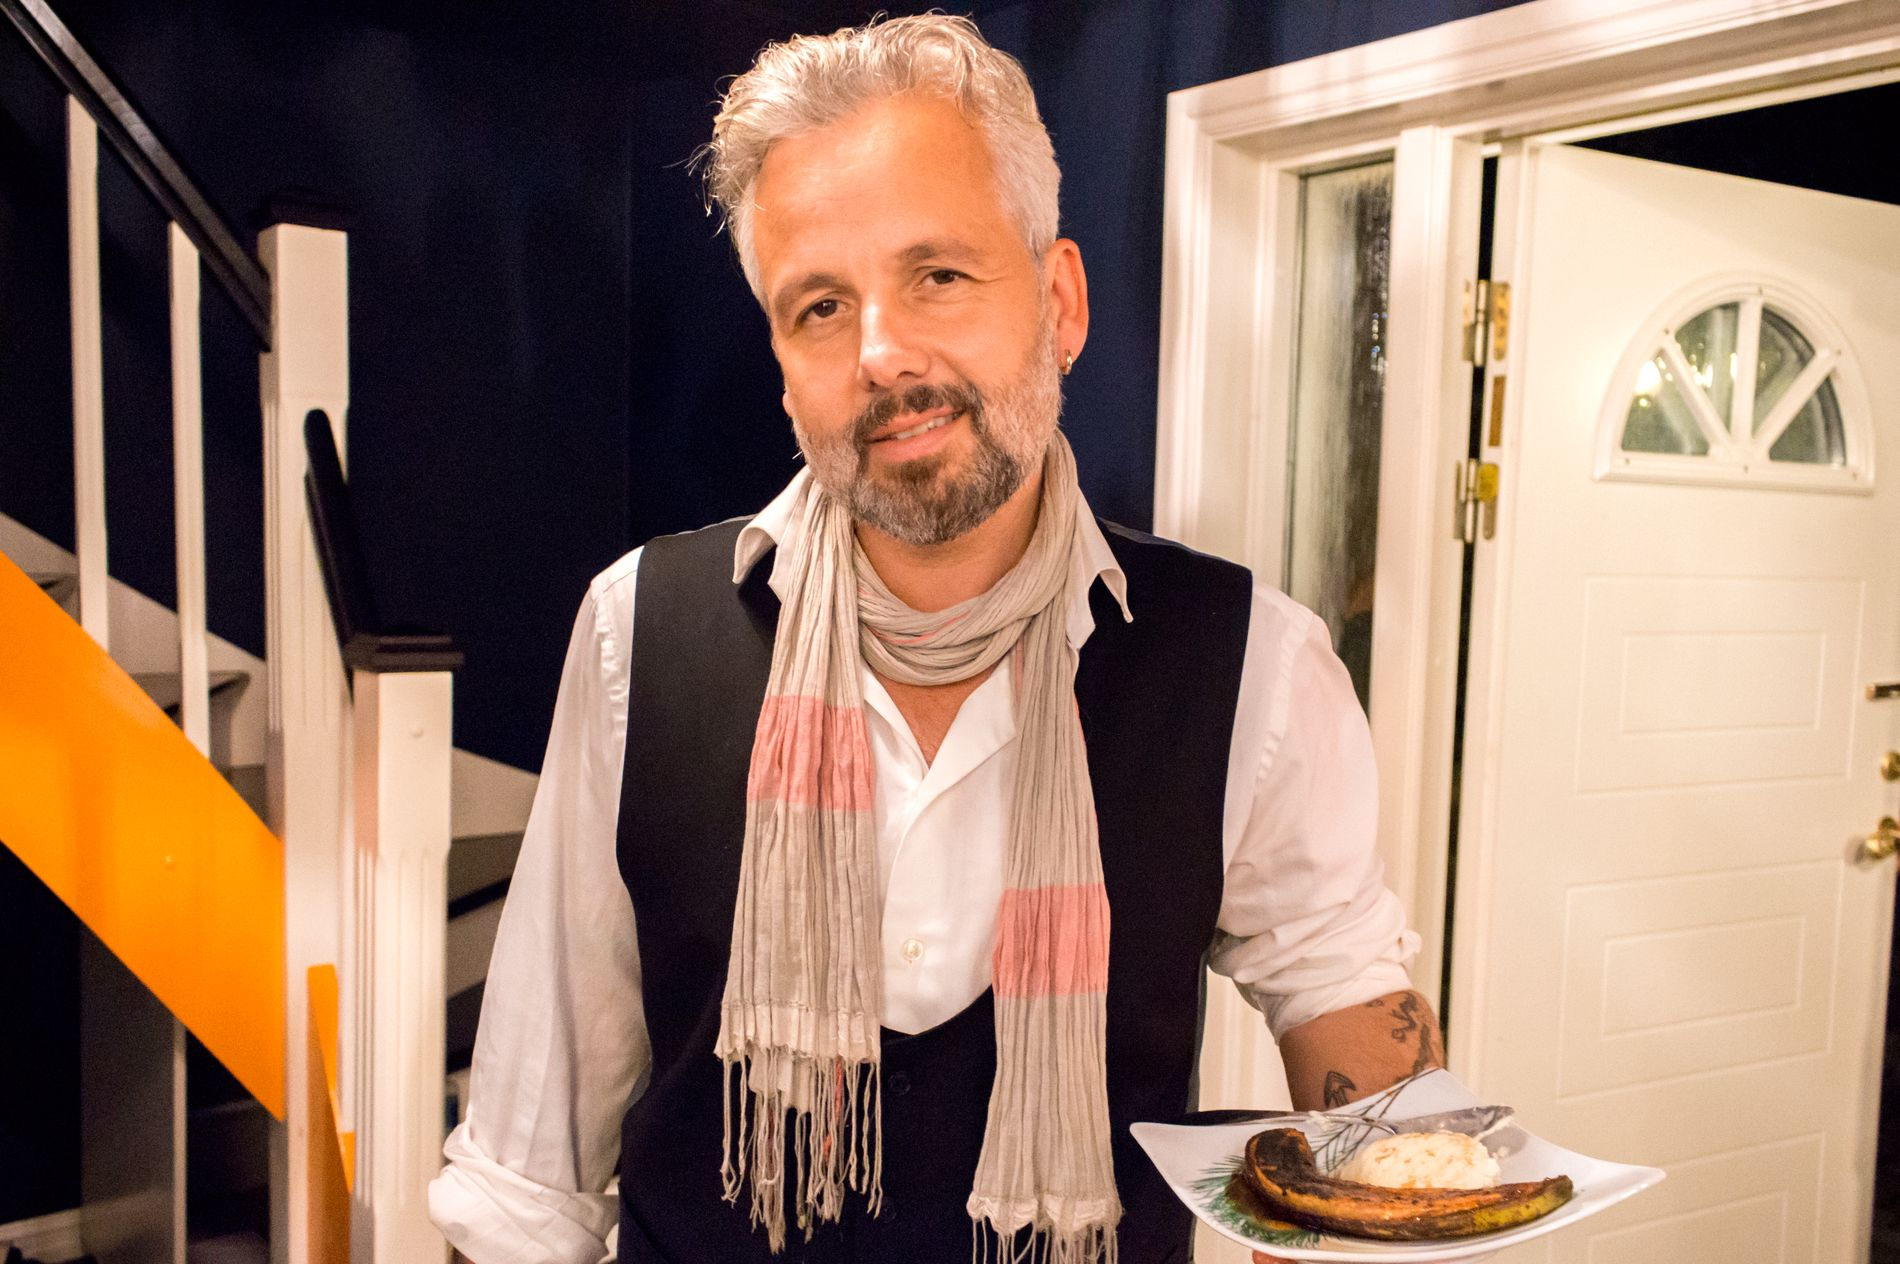 HJEMME: Ari Behn åpnet i januar hjemmet sitt i «4-stjerners middag» på TVNorge.